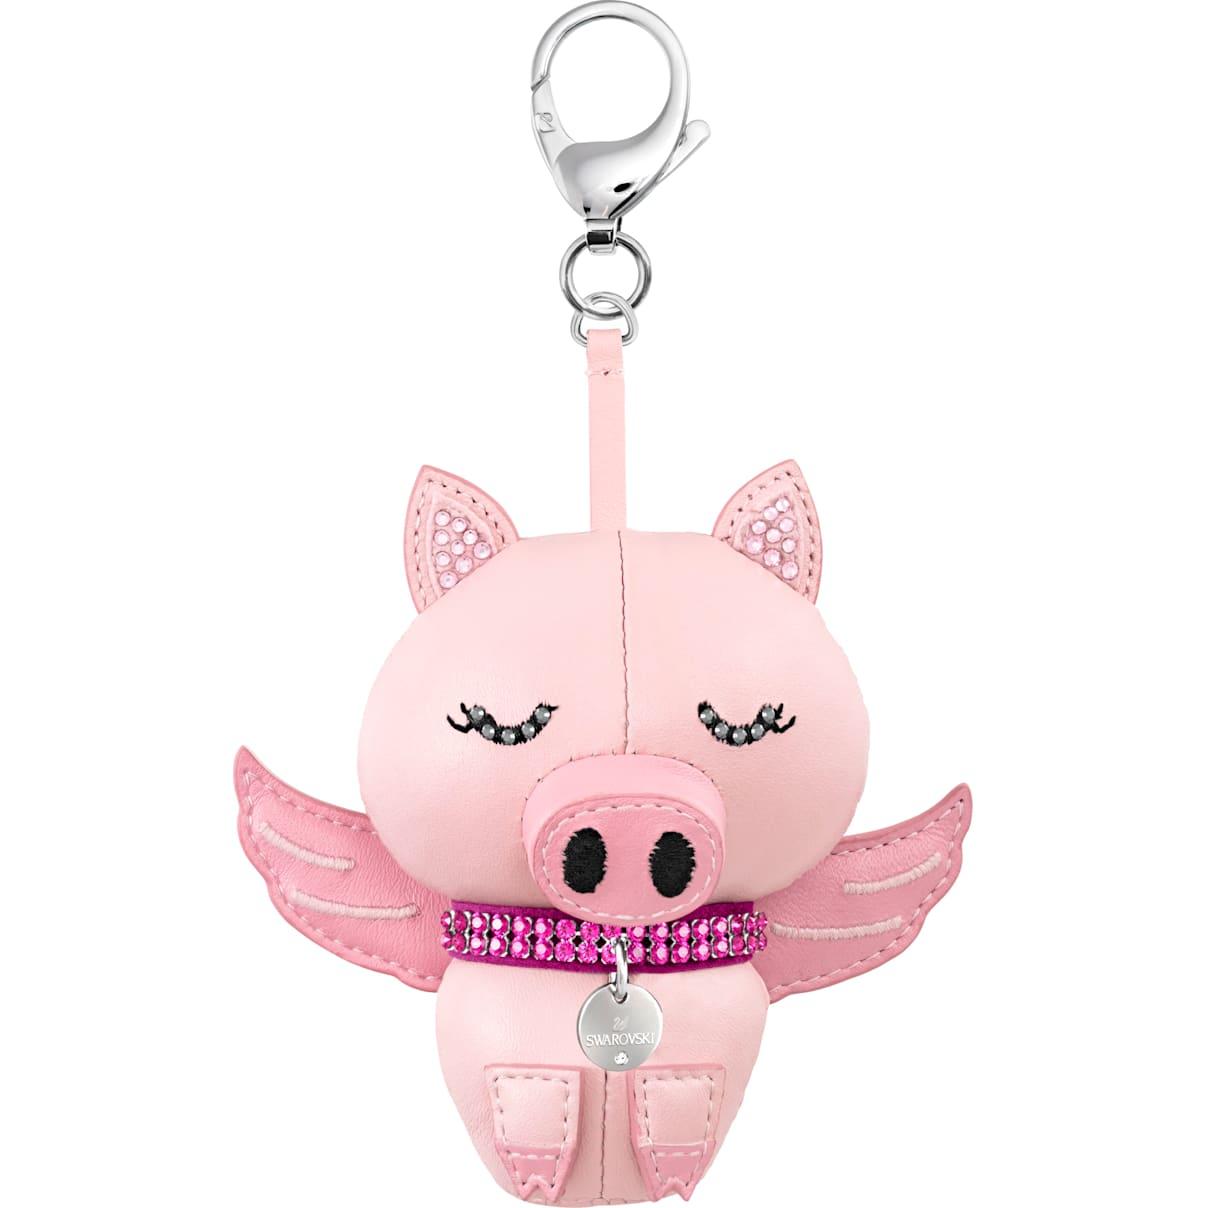 Swarovski Bu Bu Bag Charm, Pink, Rhodium plating